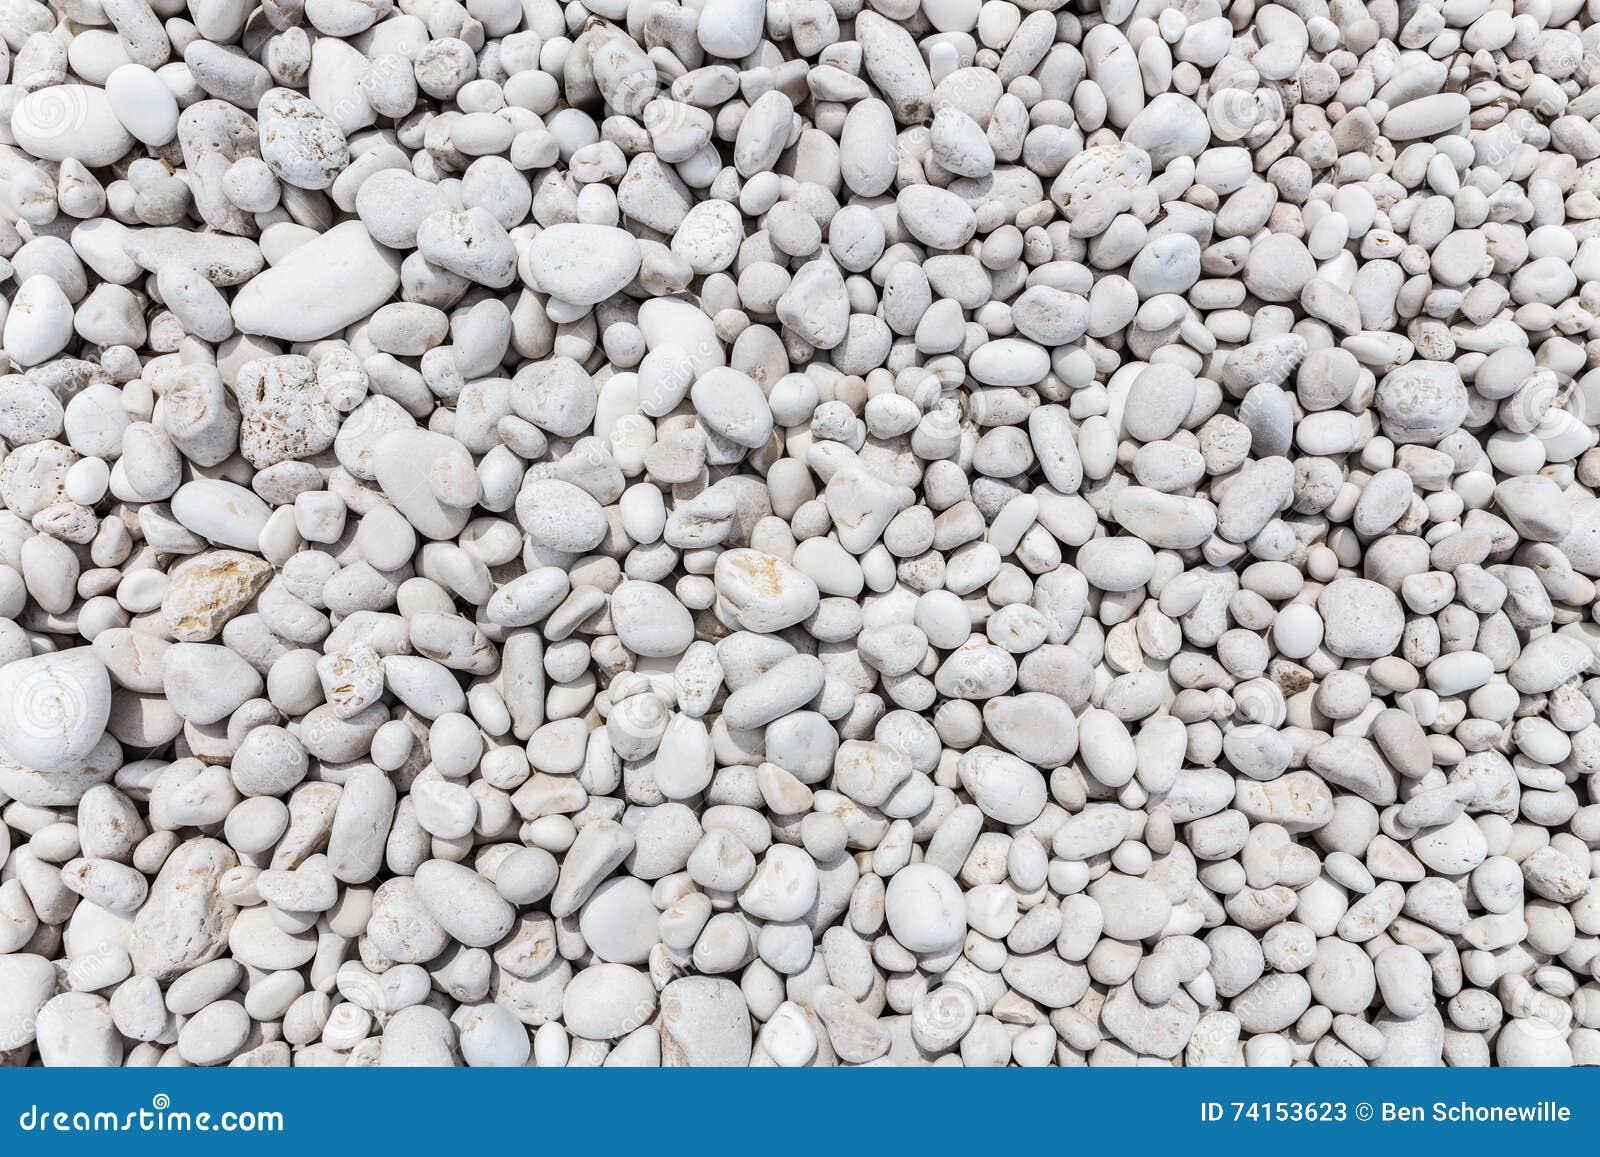 Many grey stones as background